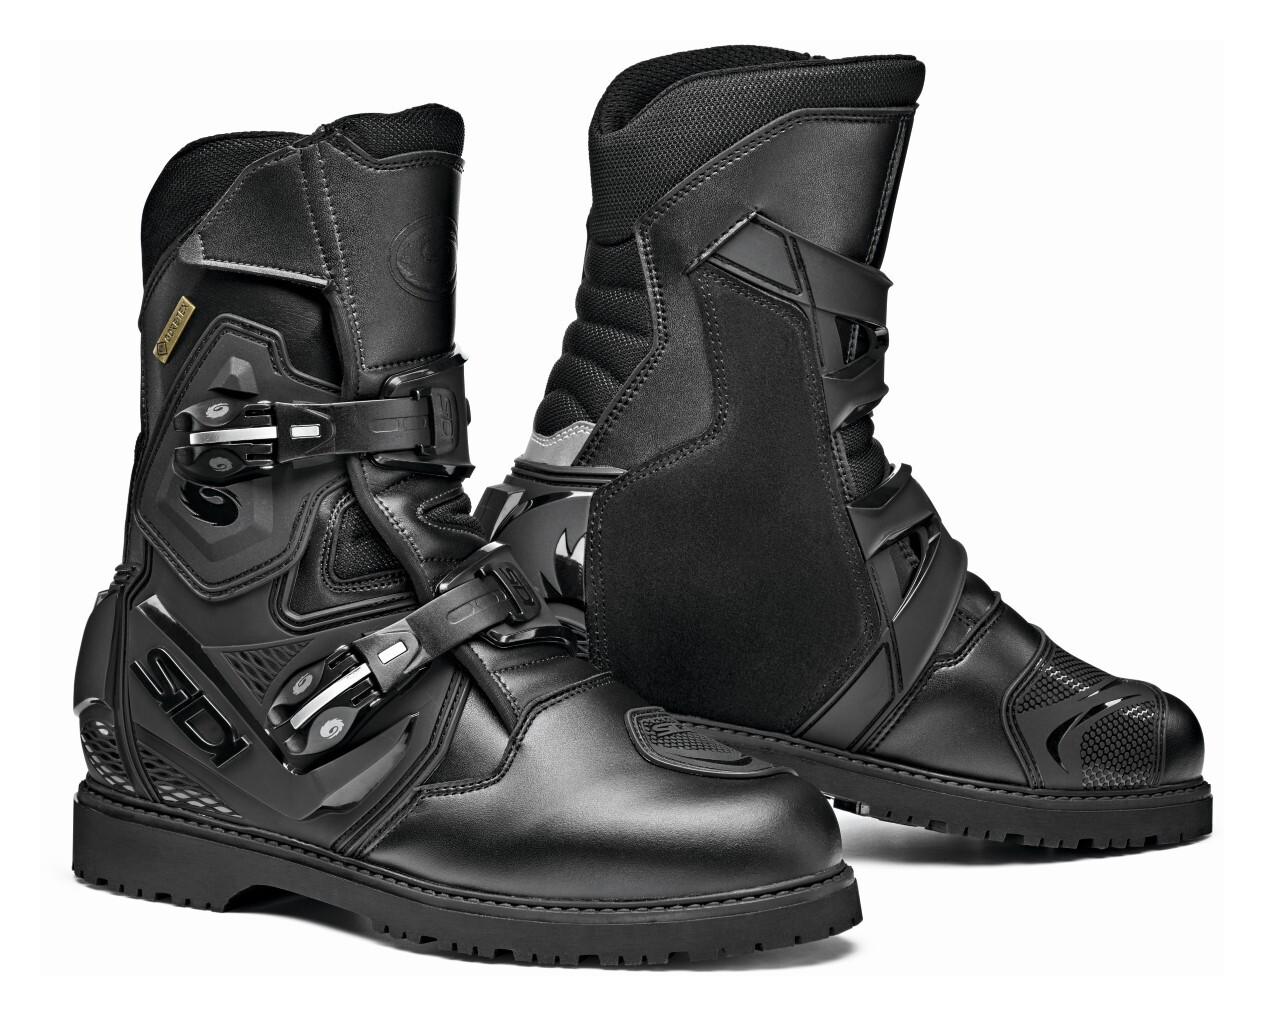 sidi_adventure_gore_tex_mid_boots_black.